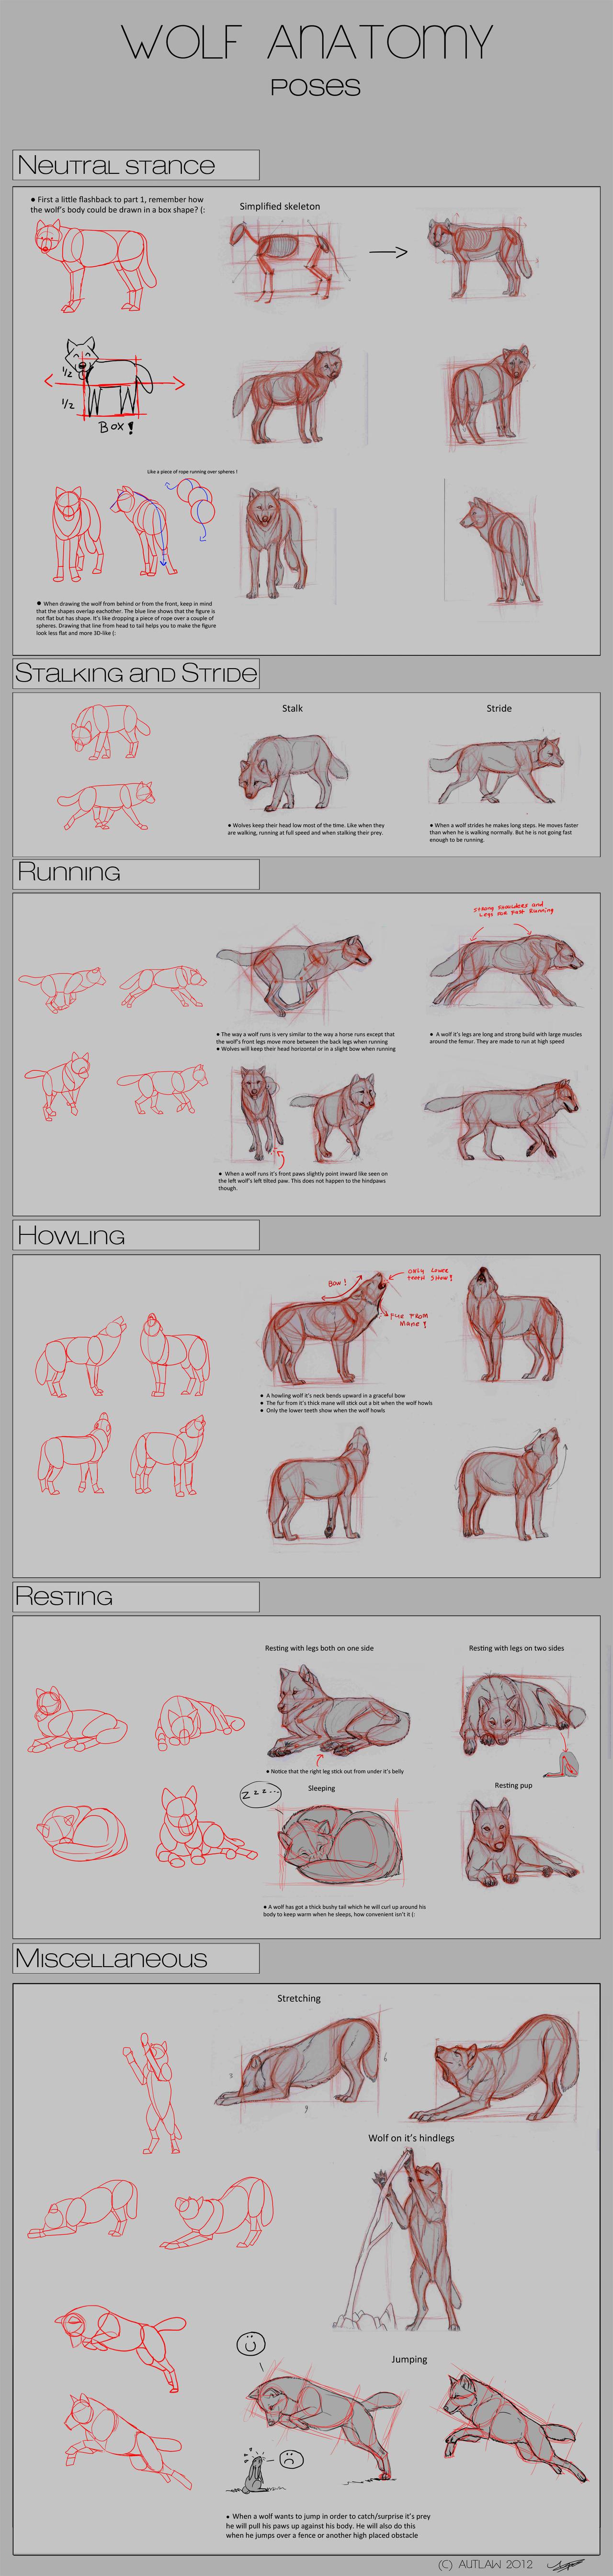 Wolf Anatomy - Part 2 by Autlaw